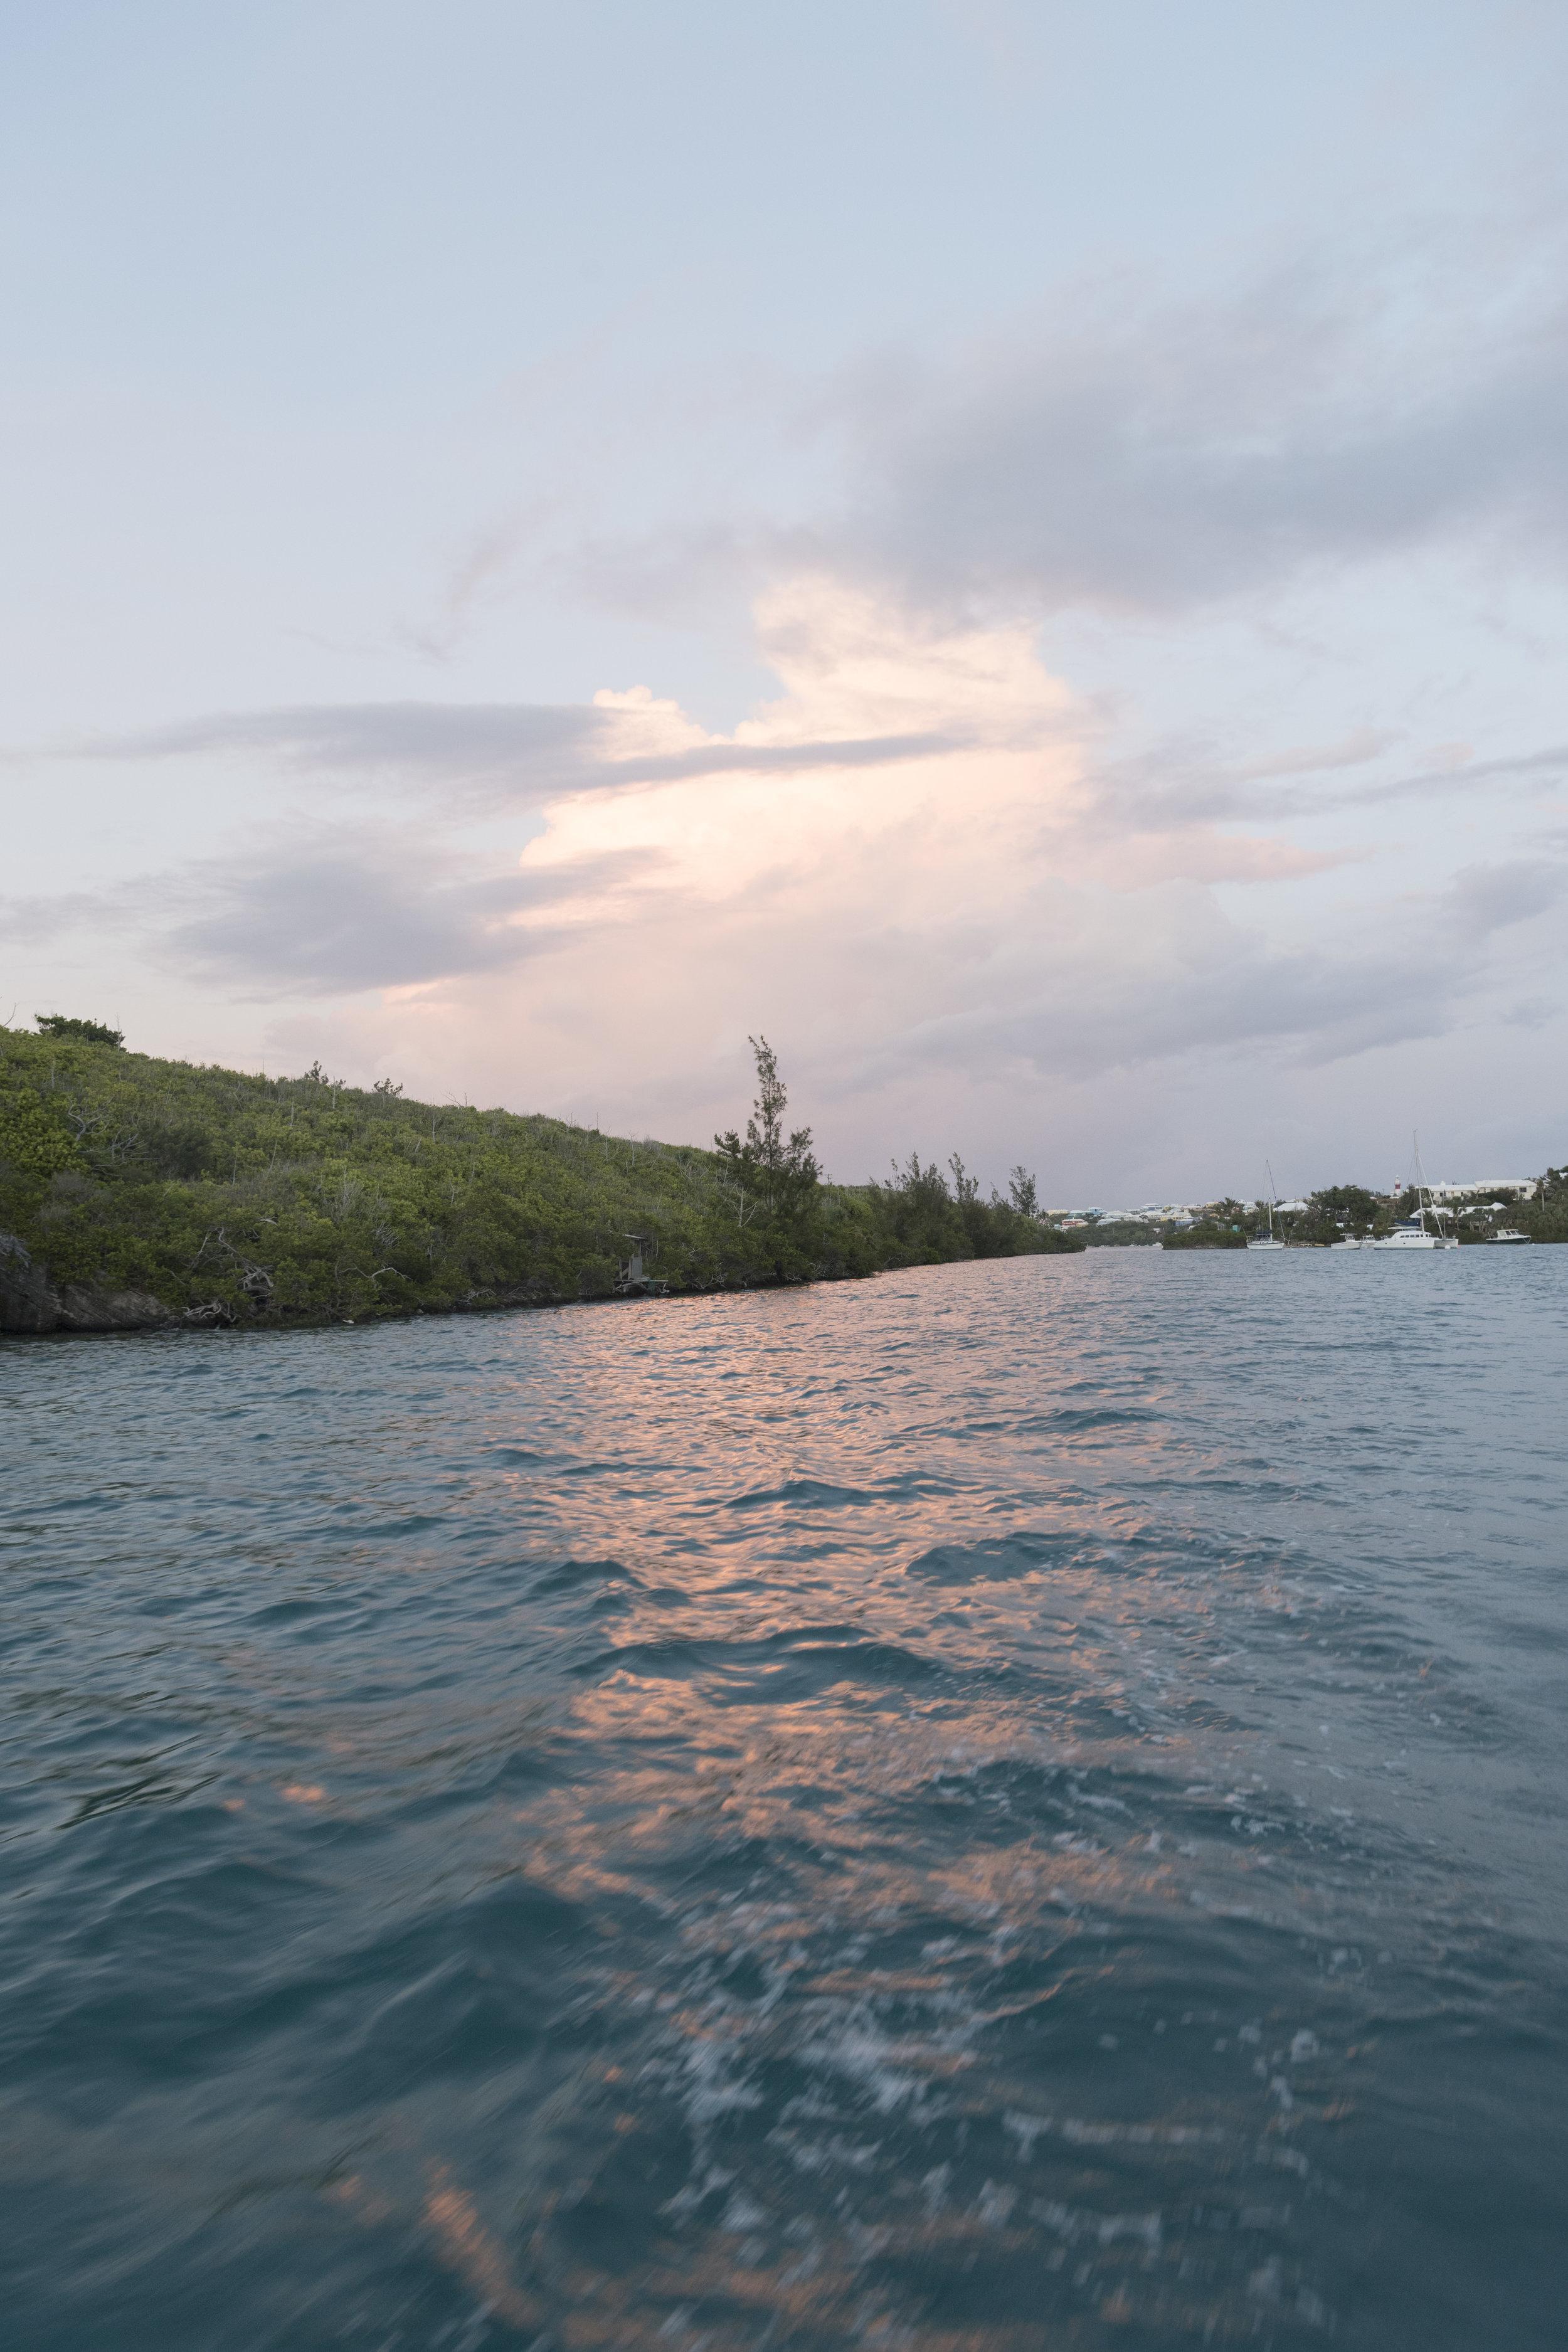 ©FianderFoto_Winnow_Fiander_M_Vacation Photos at Sea_007.JPG